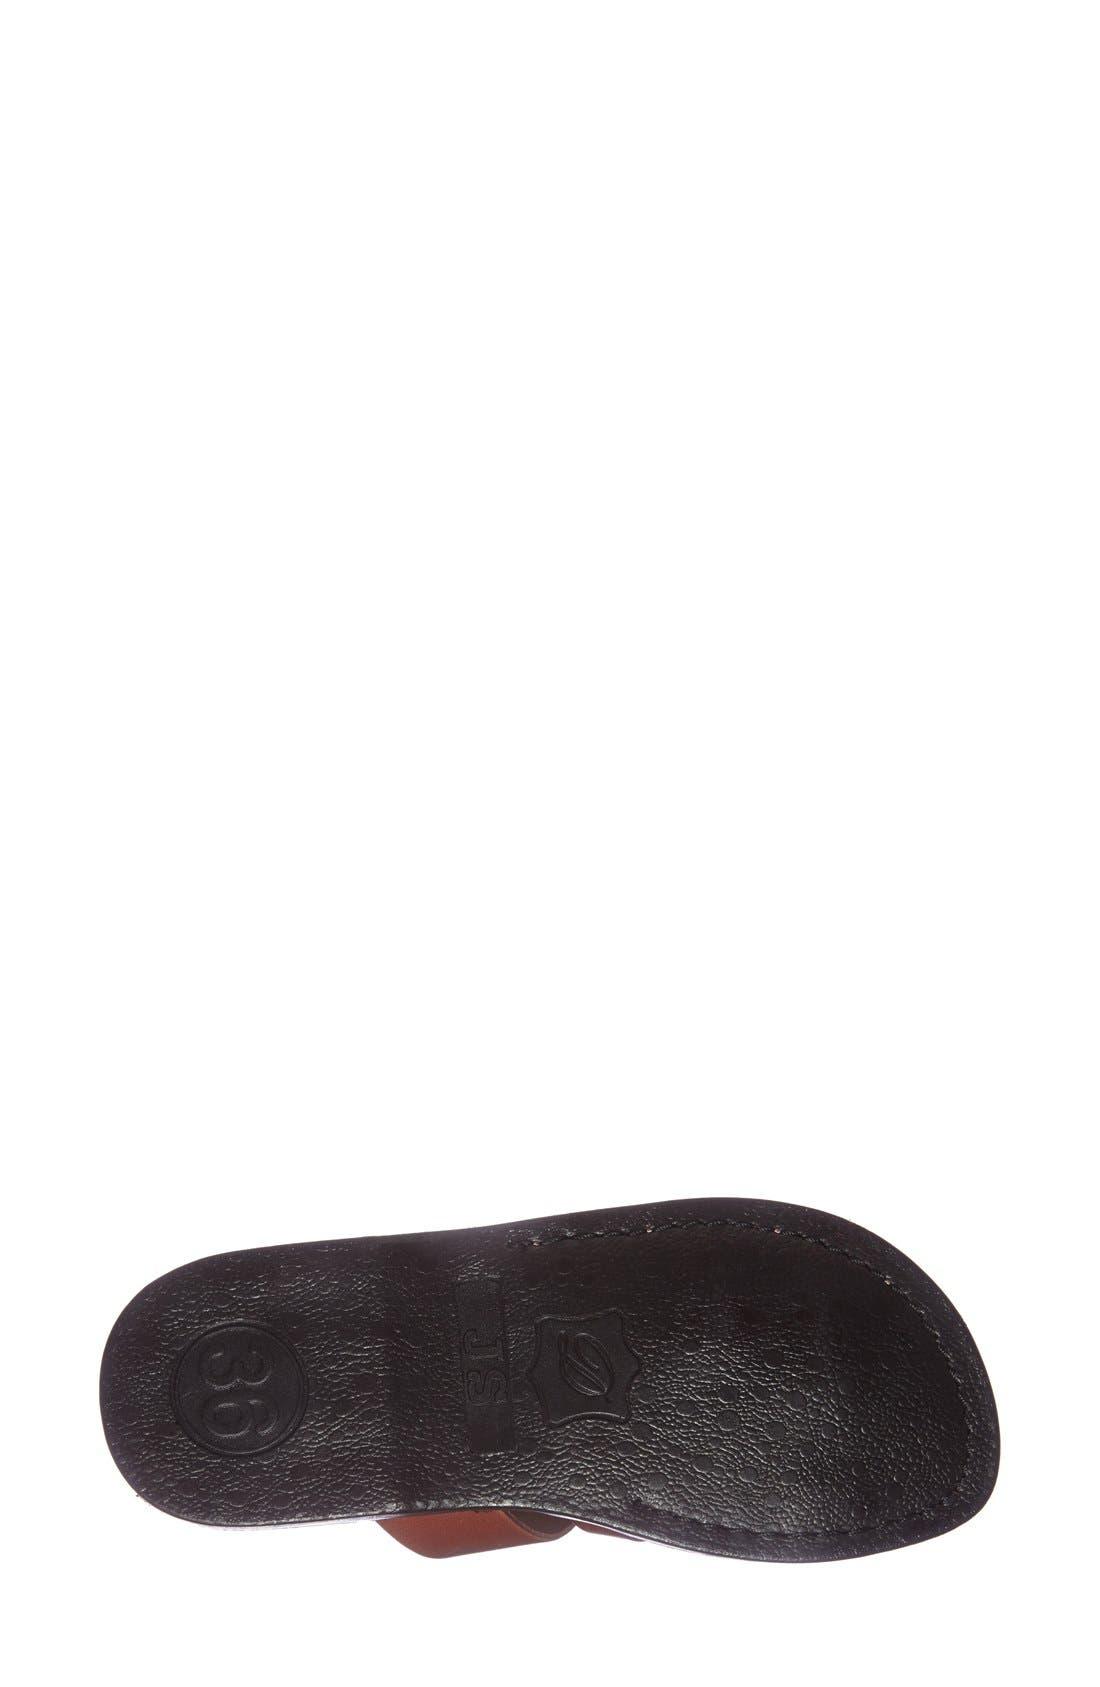 'The Good Shepard' Leather Sandal,                             Alternate thumbnail 29, color,